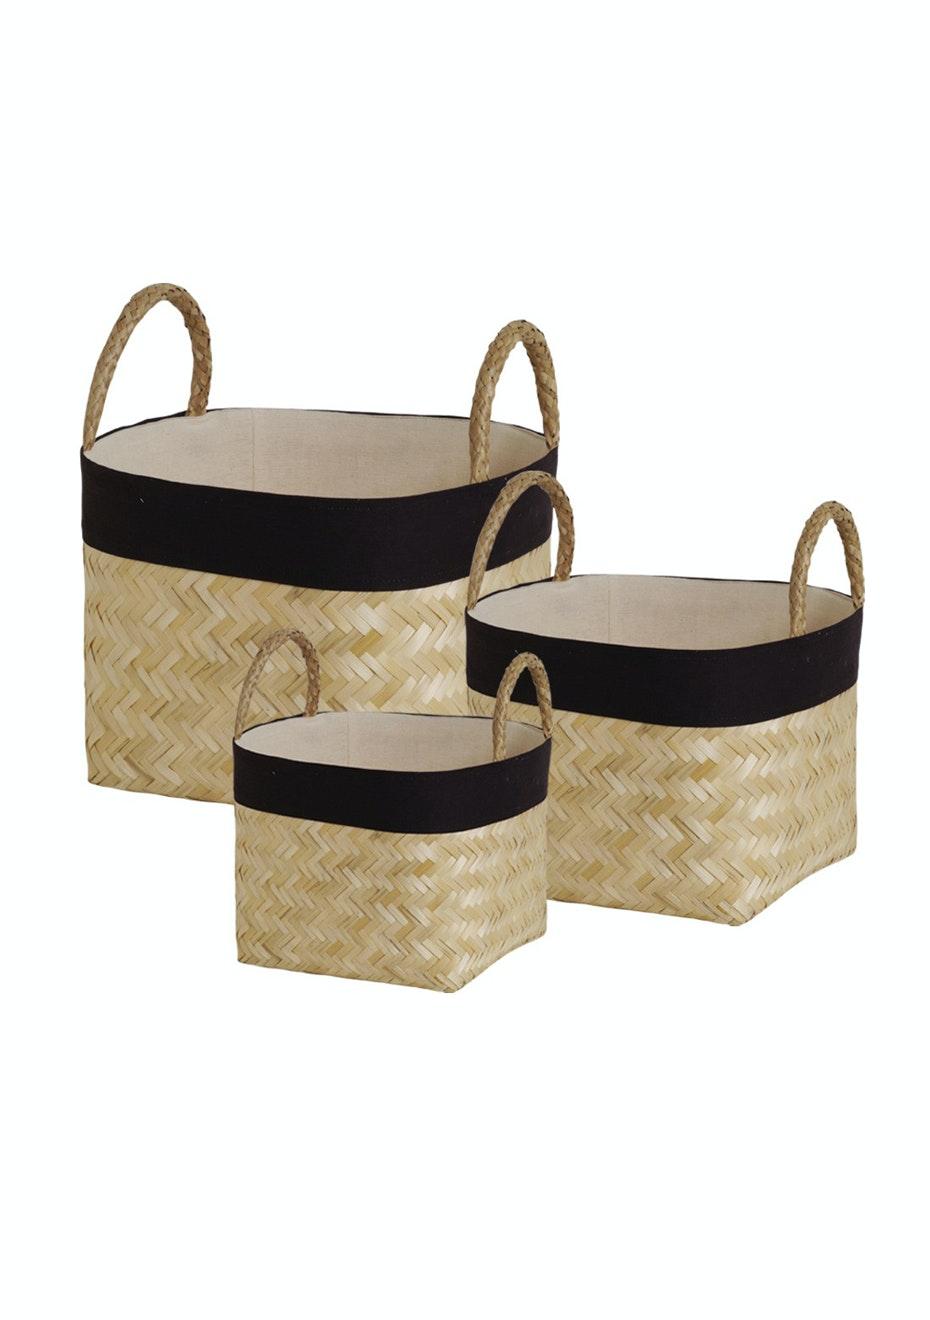 Jason - Natural Contrast Trim Baskets - Set of 3